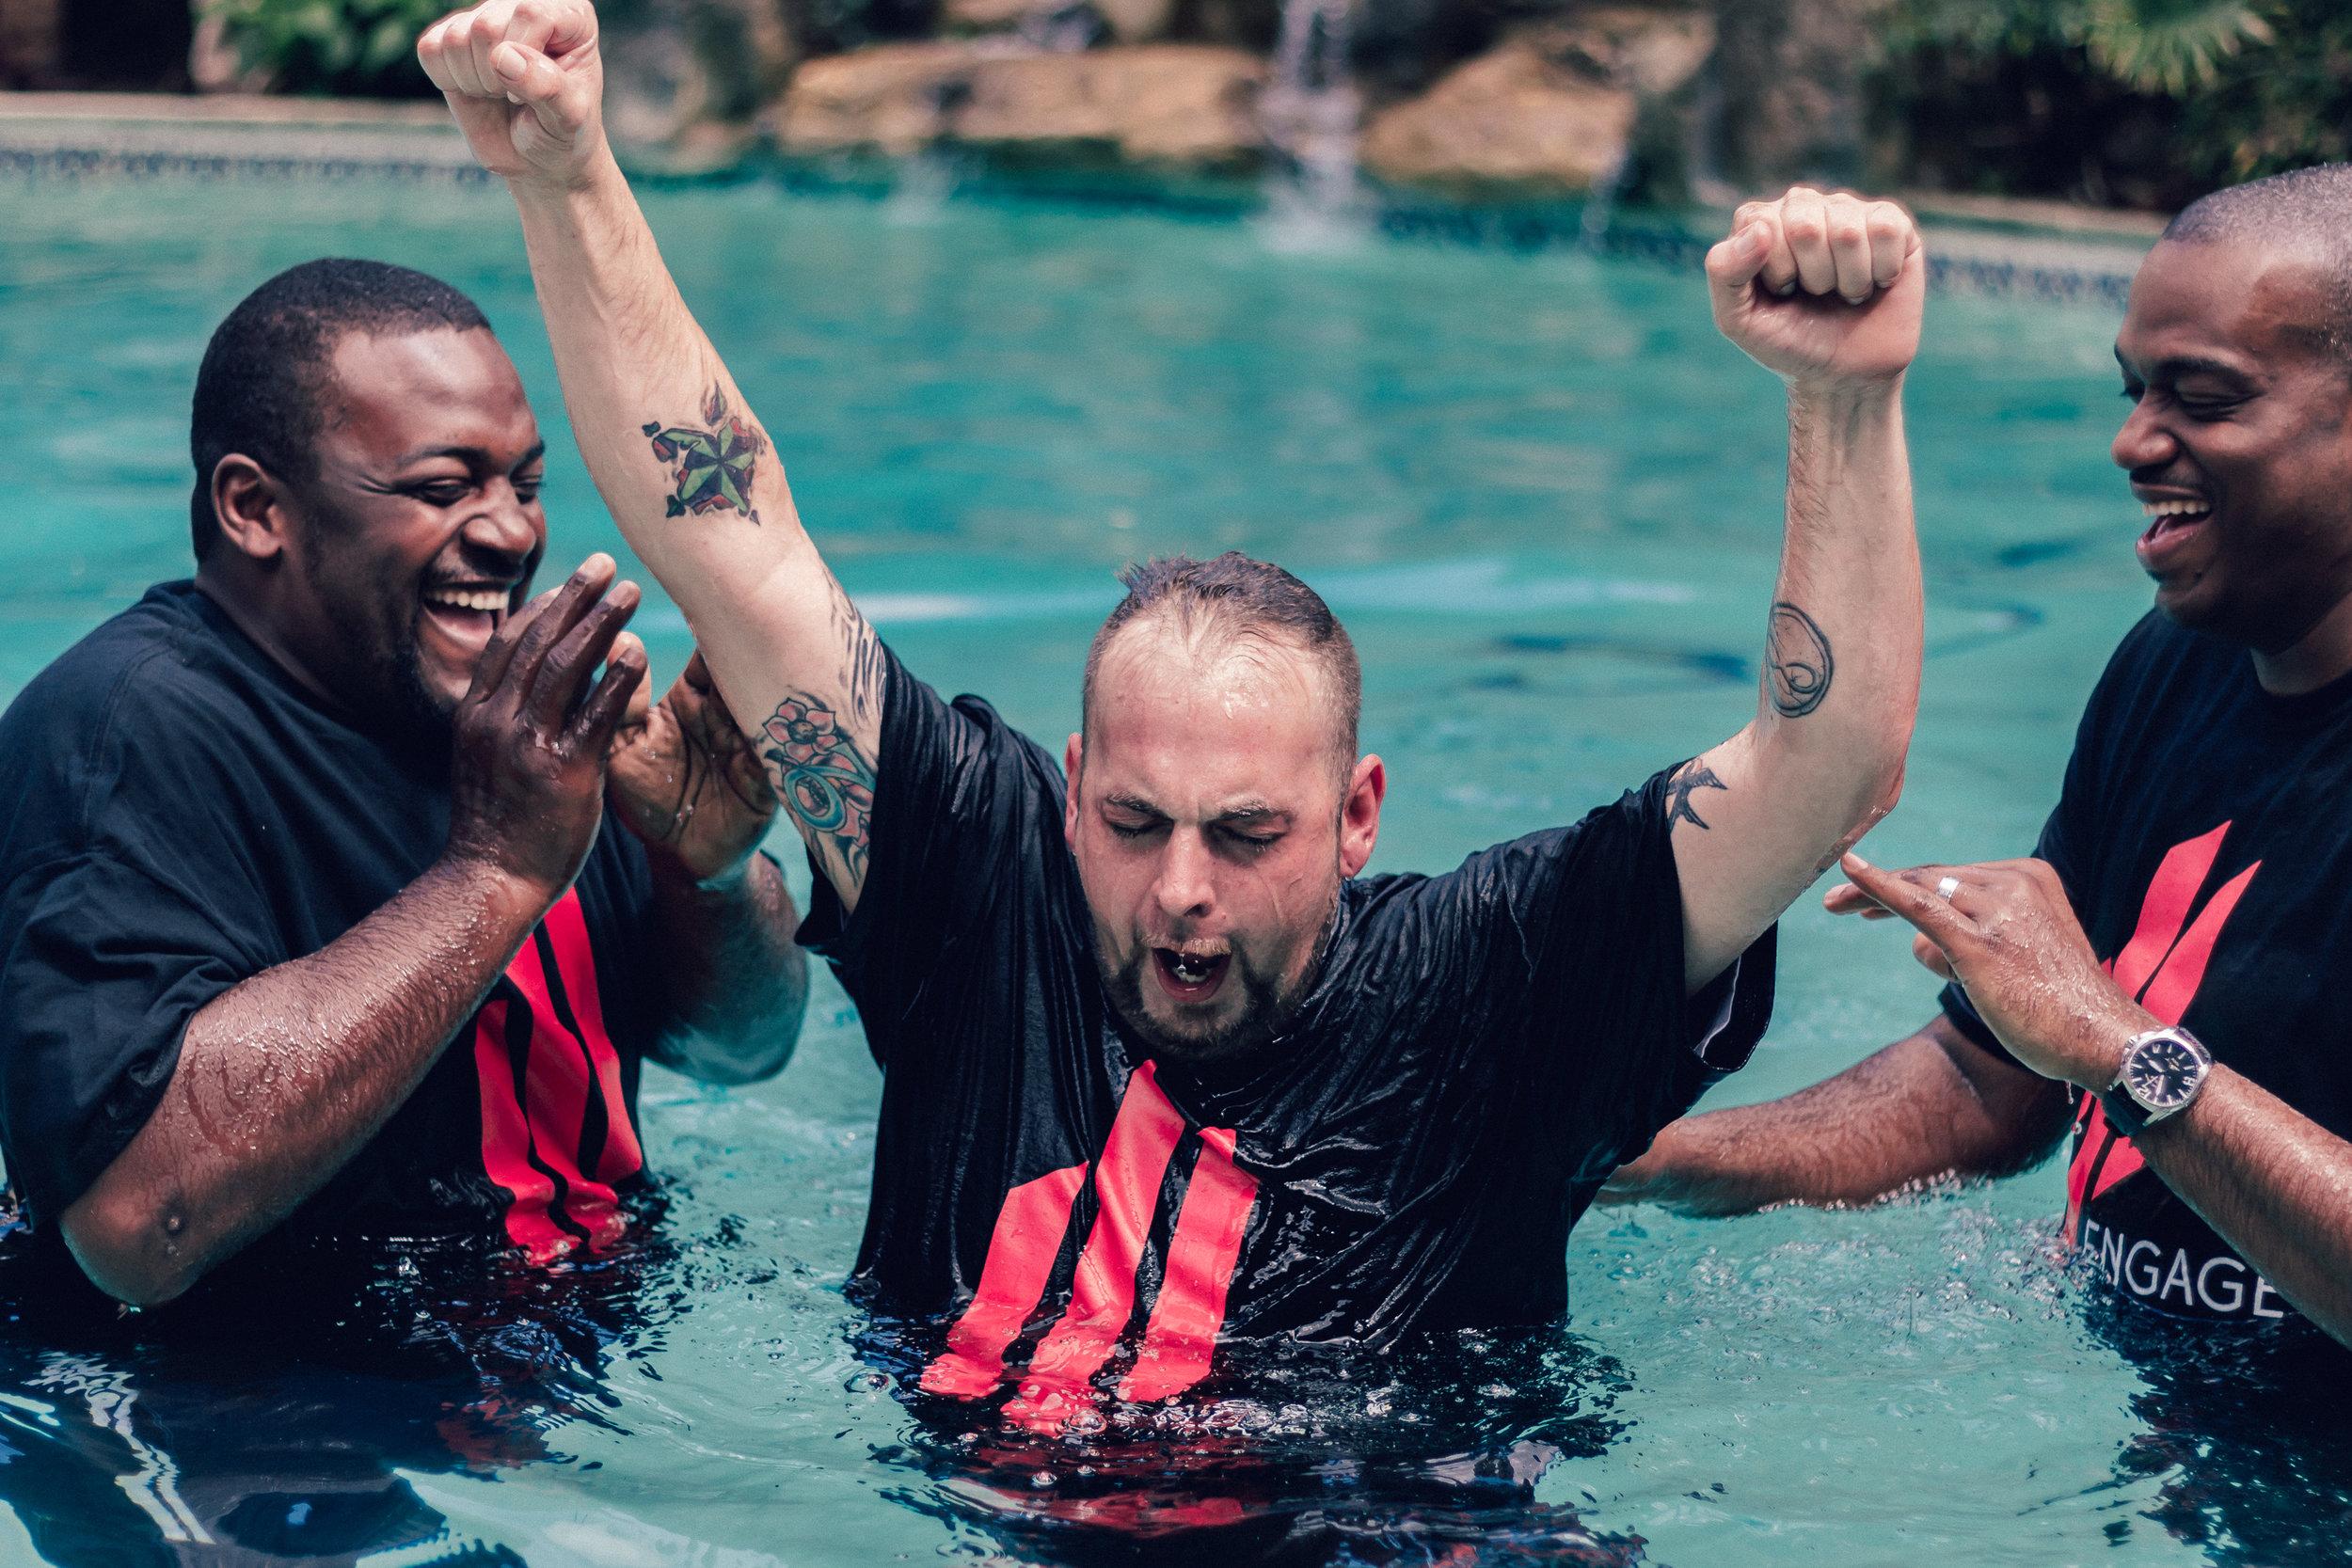 Paul baptized at Engage Church